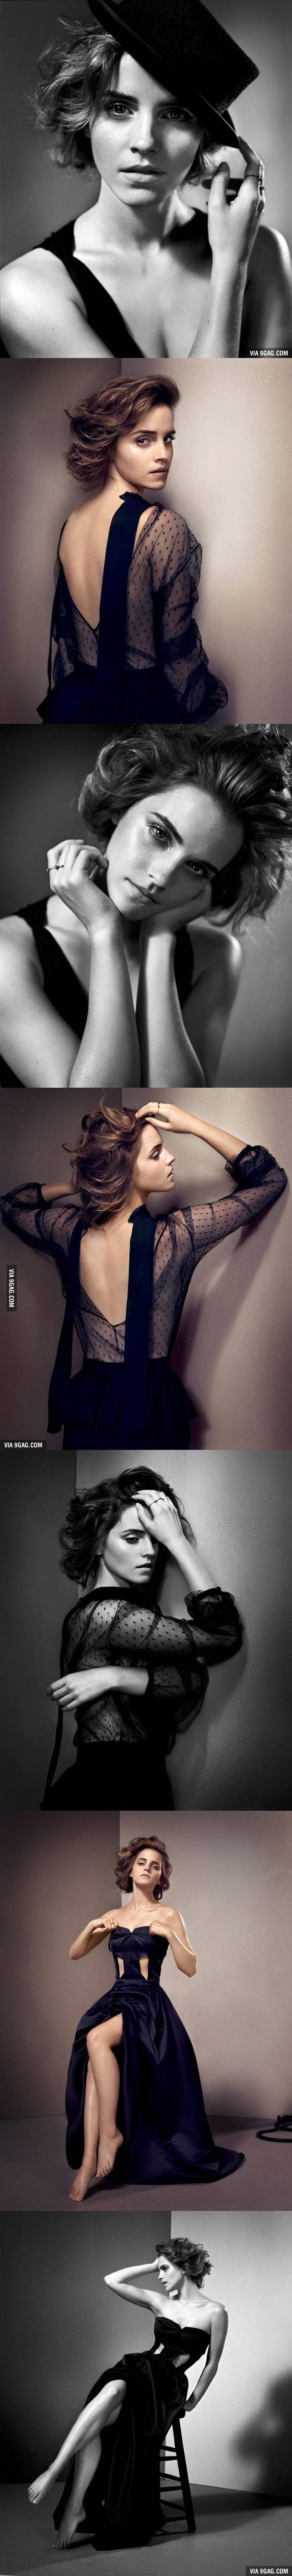 Emma Watson Being Classy